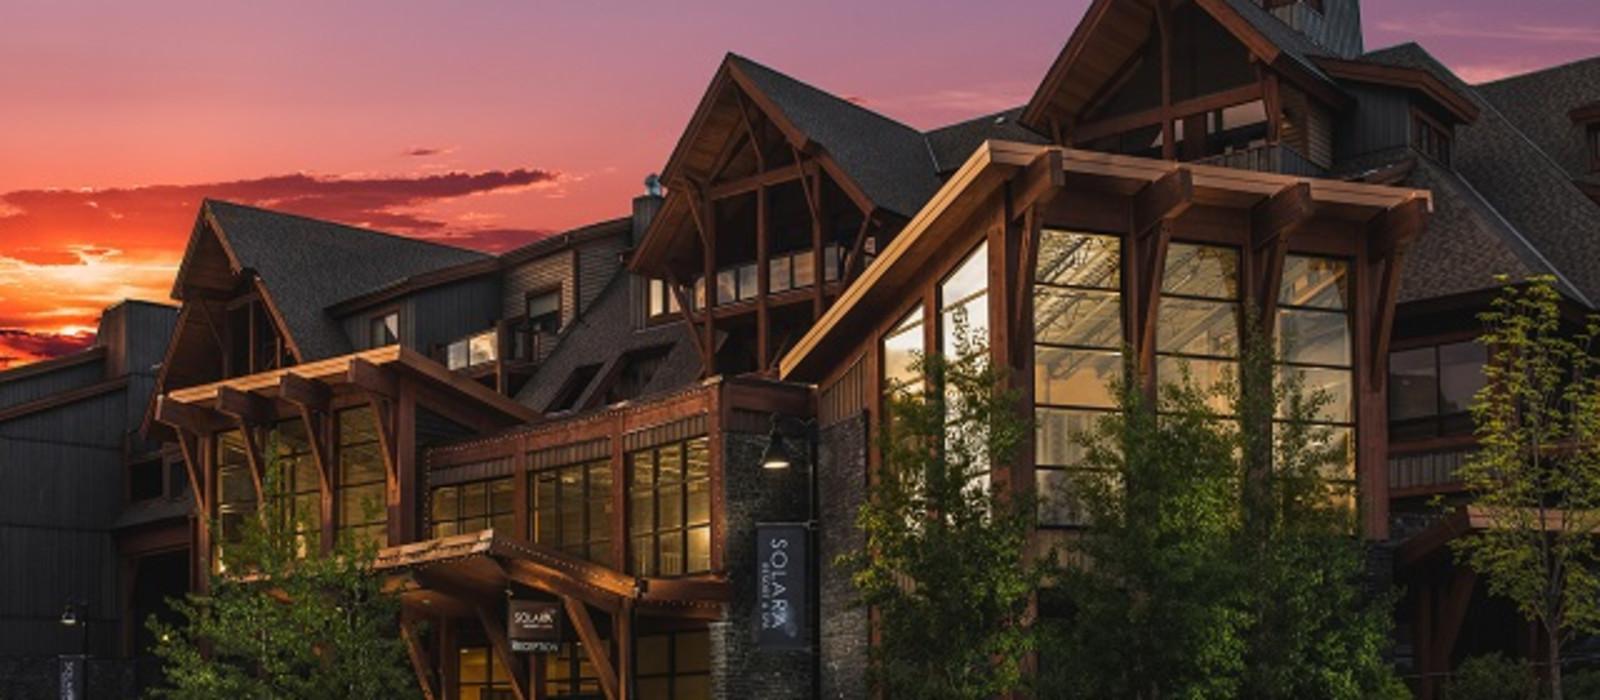 Hotel Solara Resort Kanada